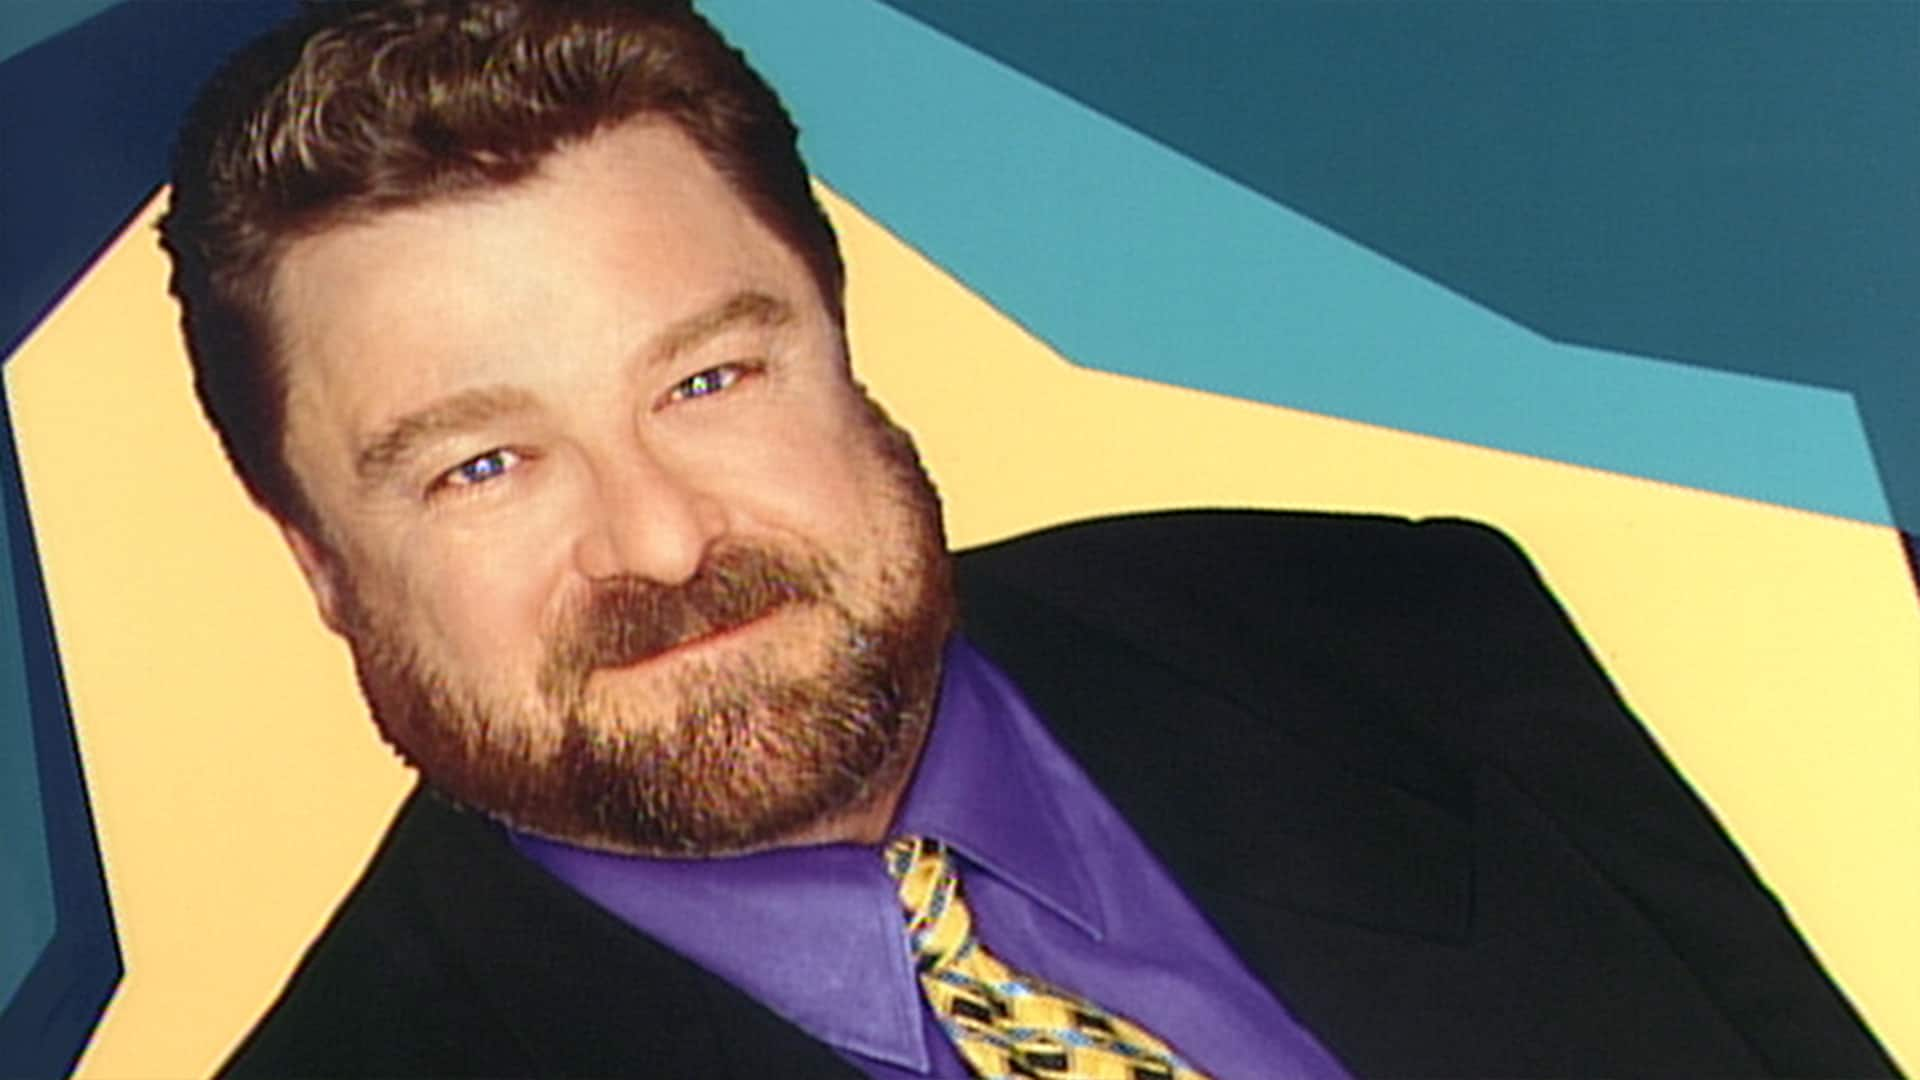 John Goodman: February 7, 1998